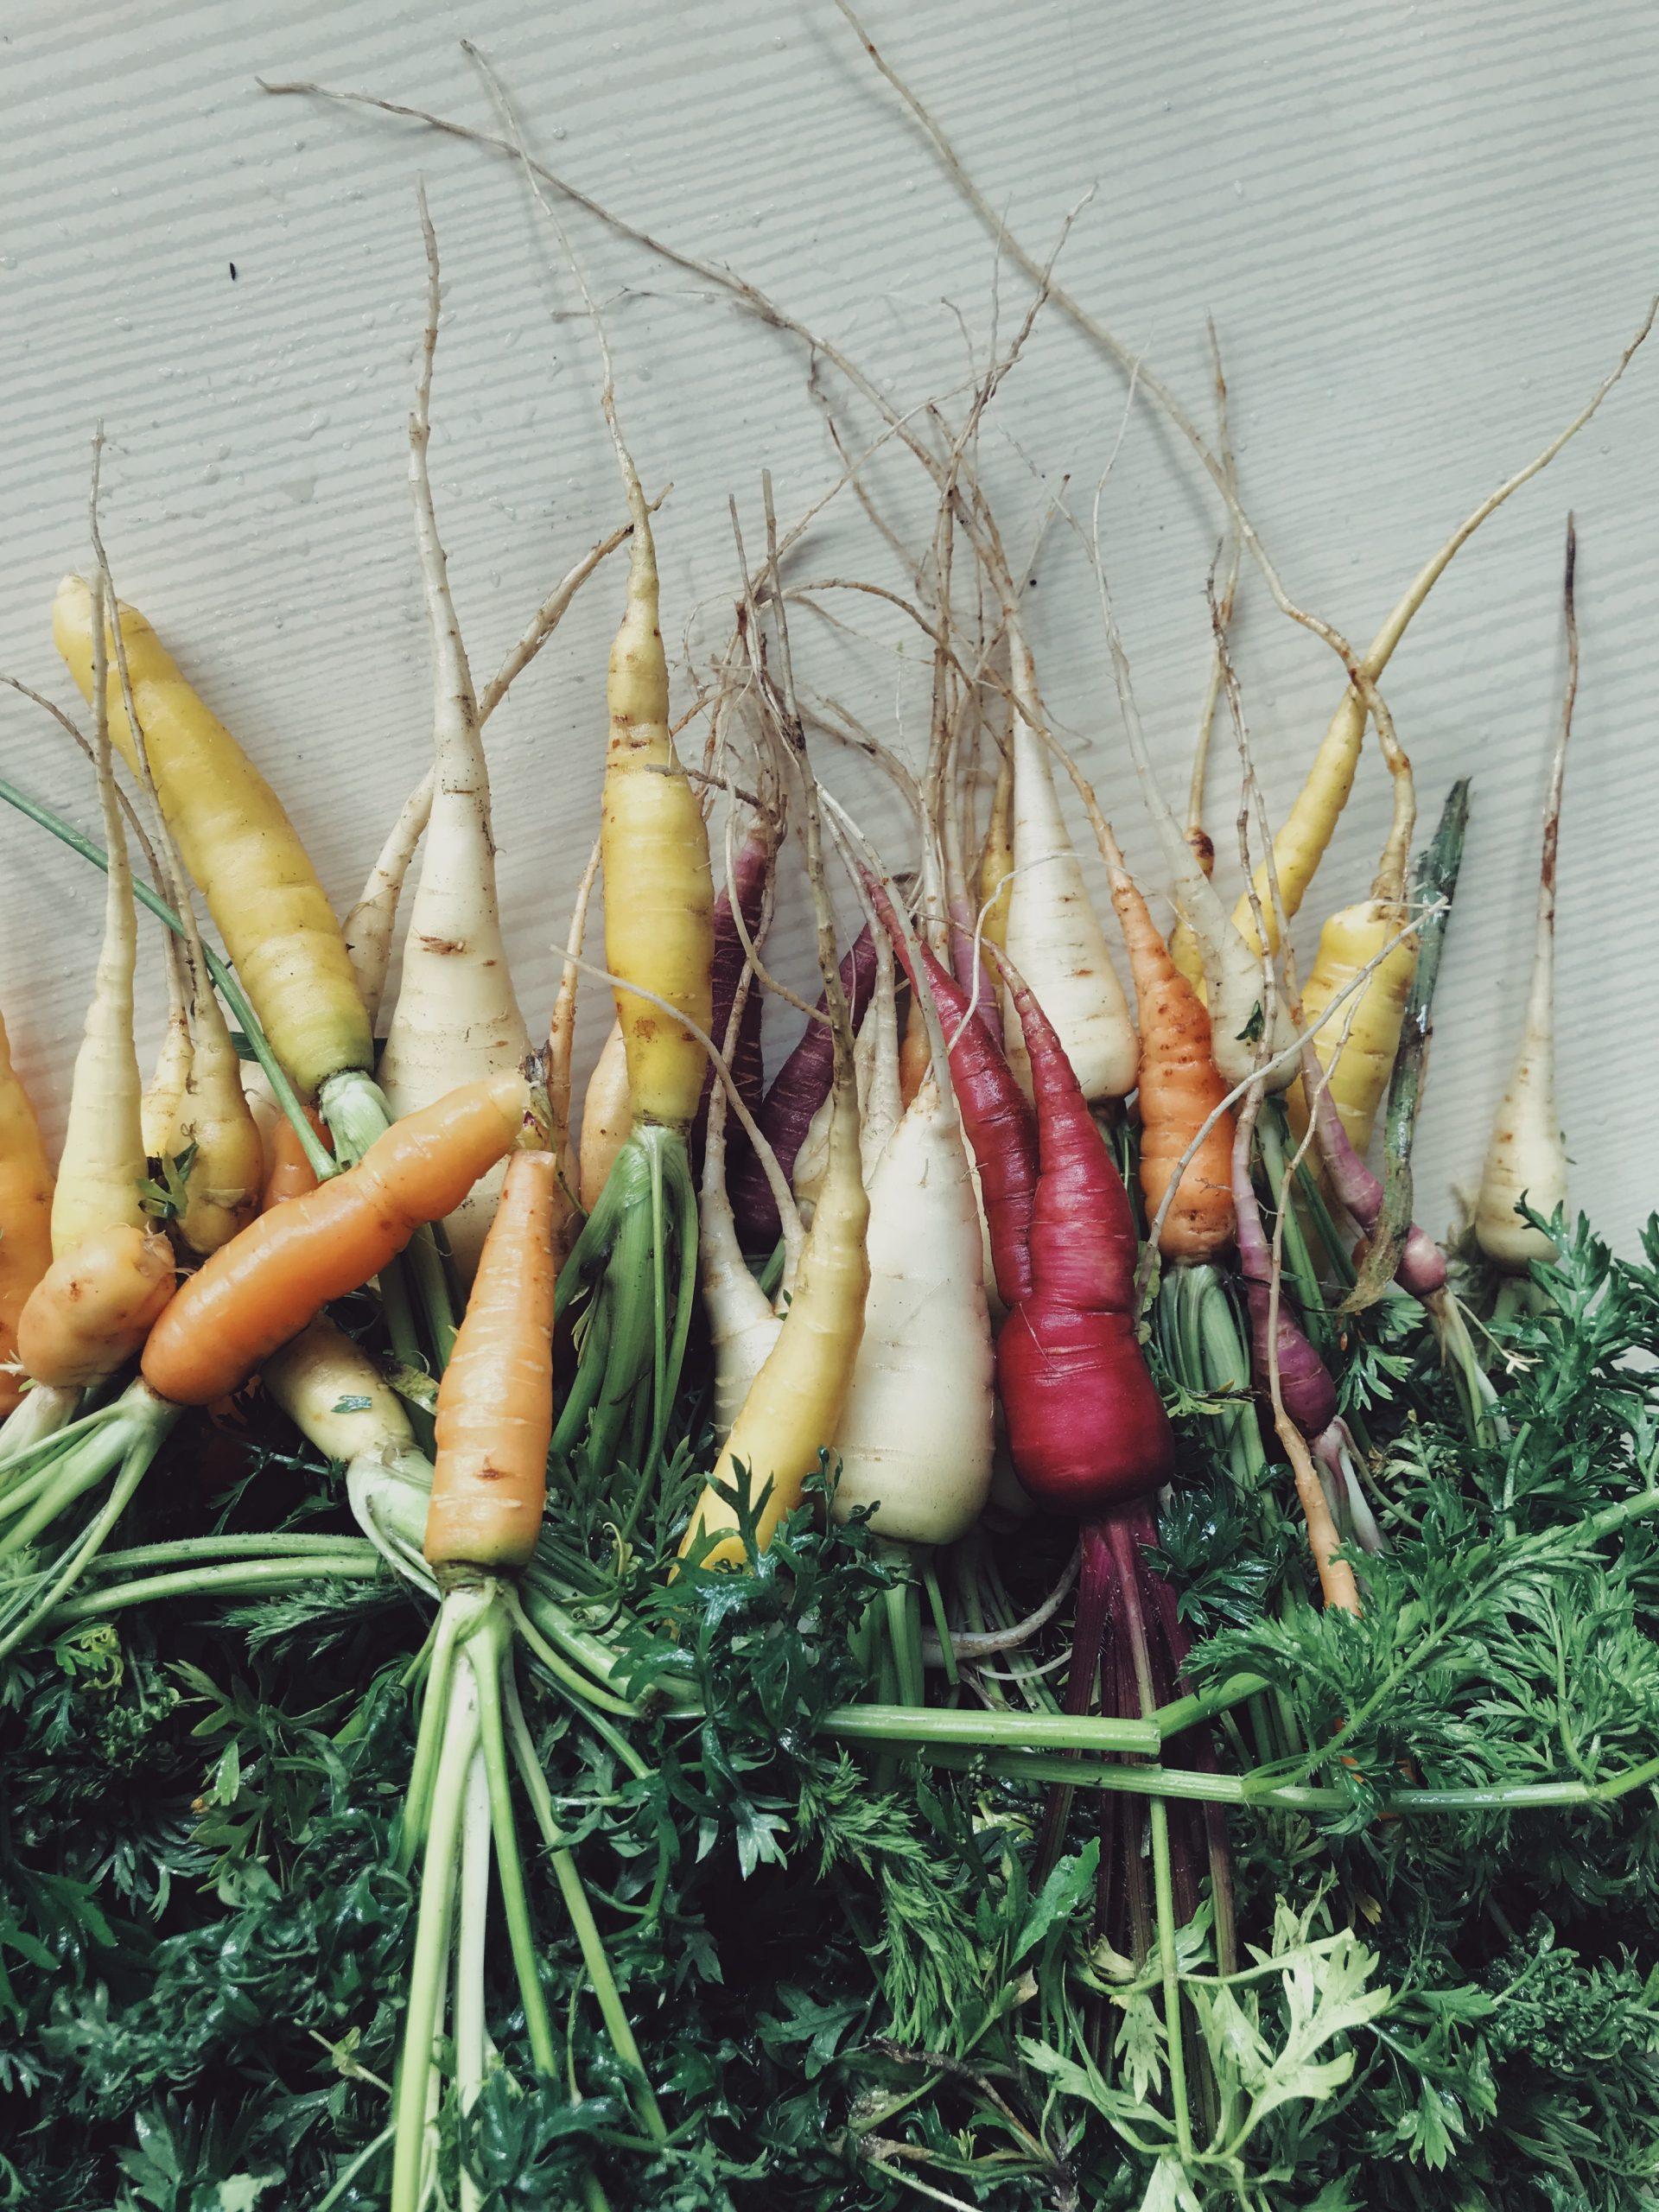 organic-vegetables-carrot-allotment-urban-garden